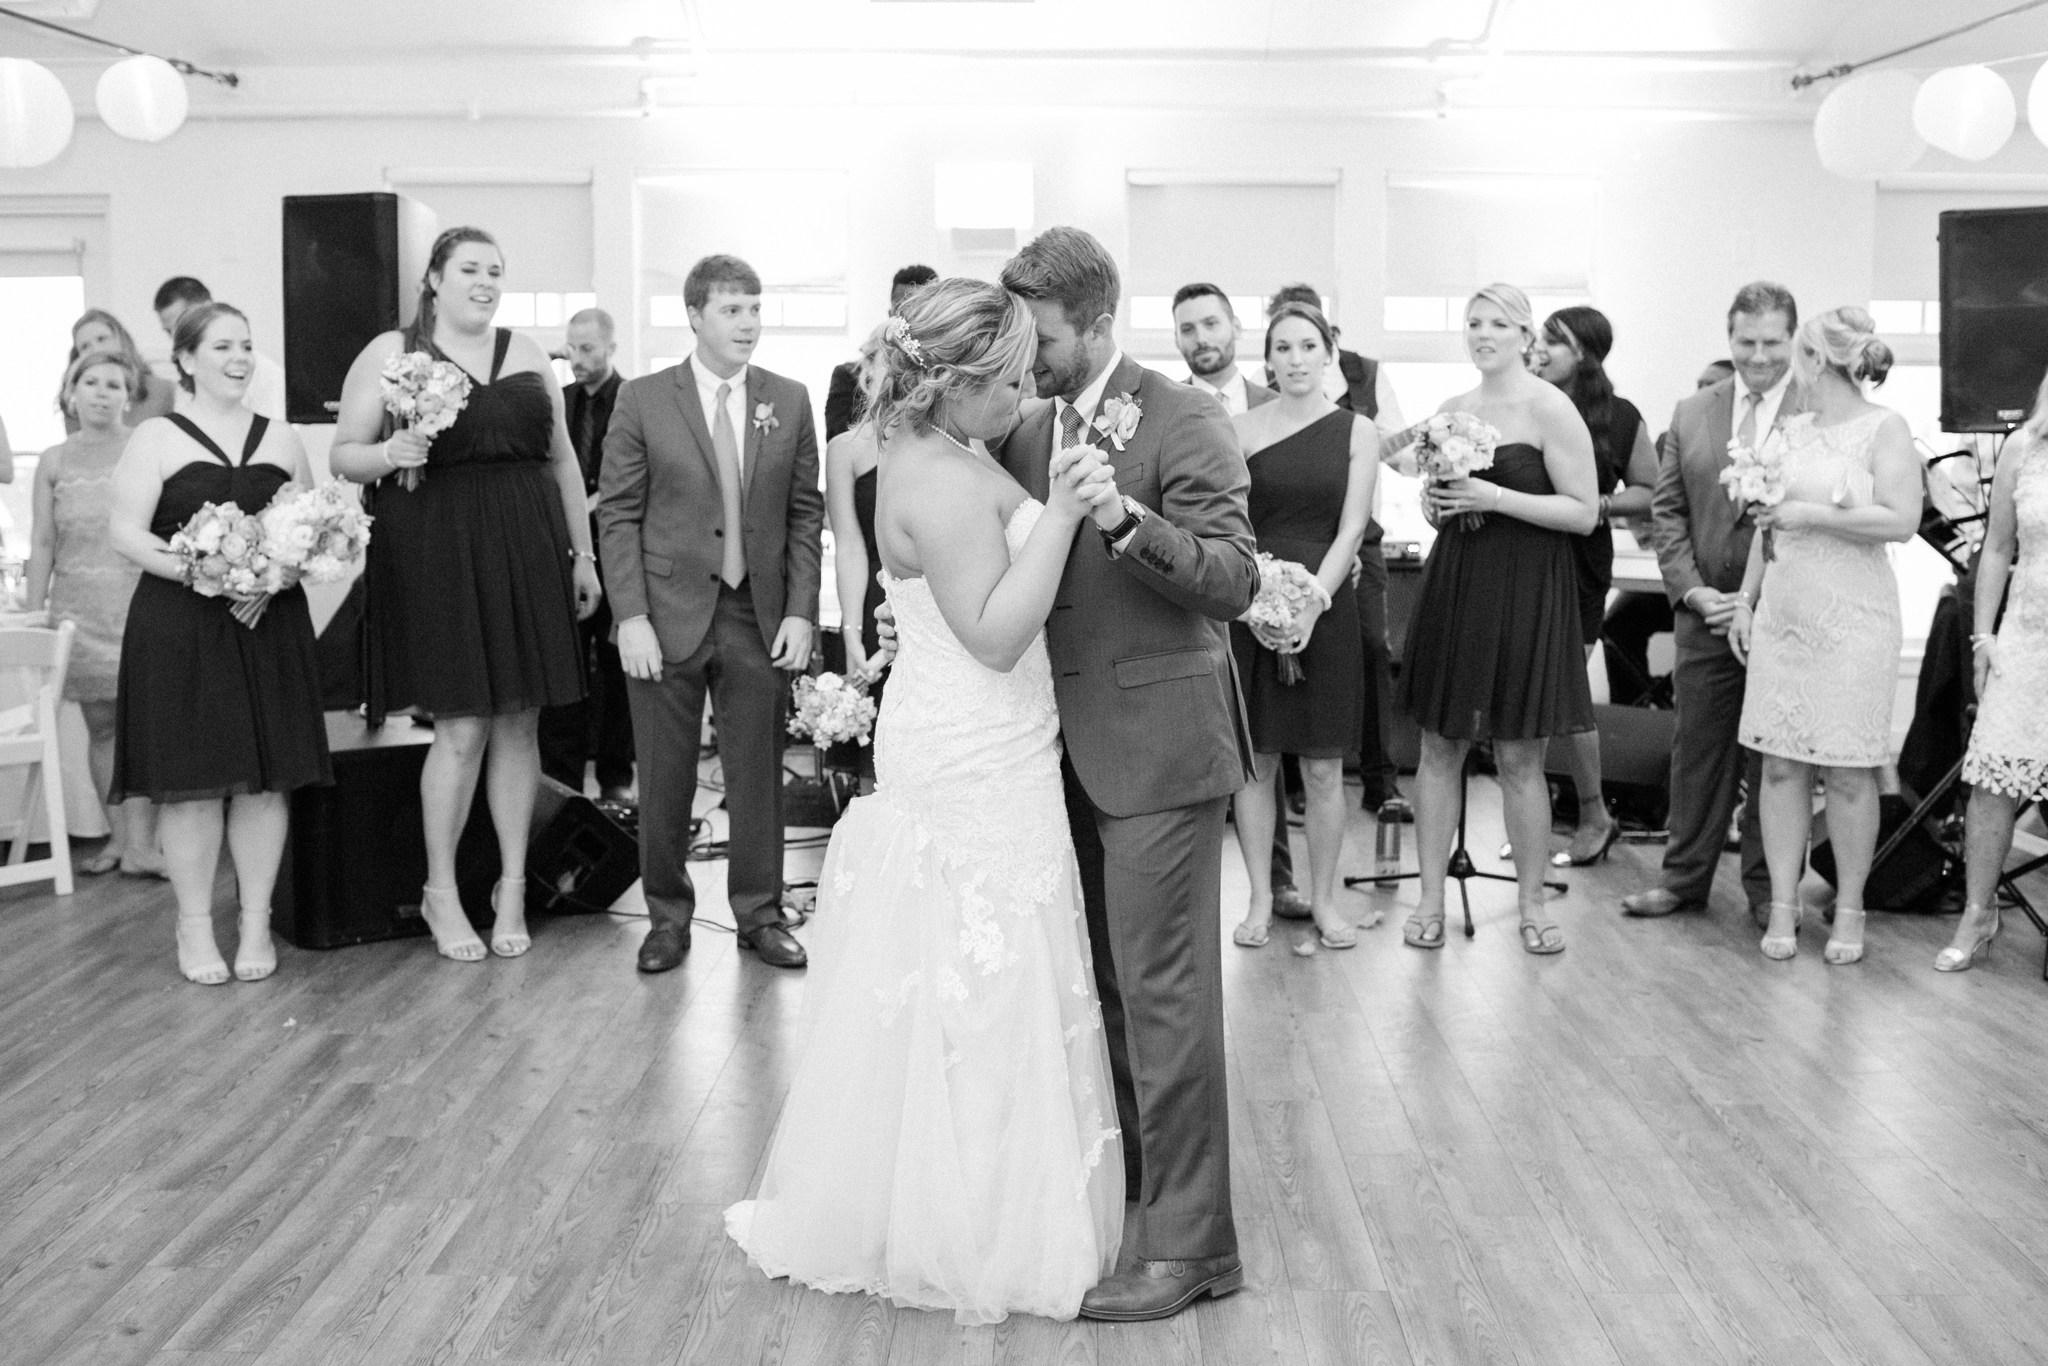 duxbury_bay_maritime_school_wedding_deborah_zoe_0046.JPG